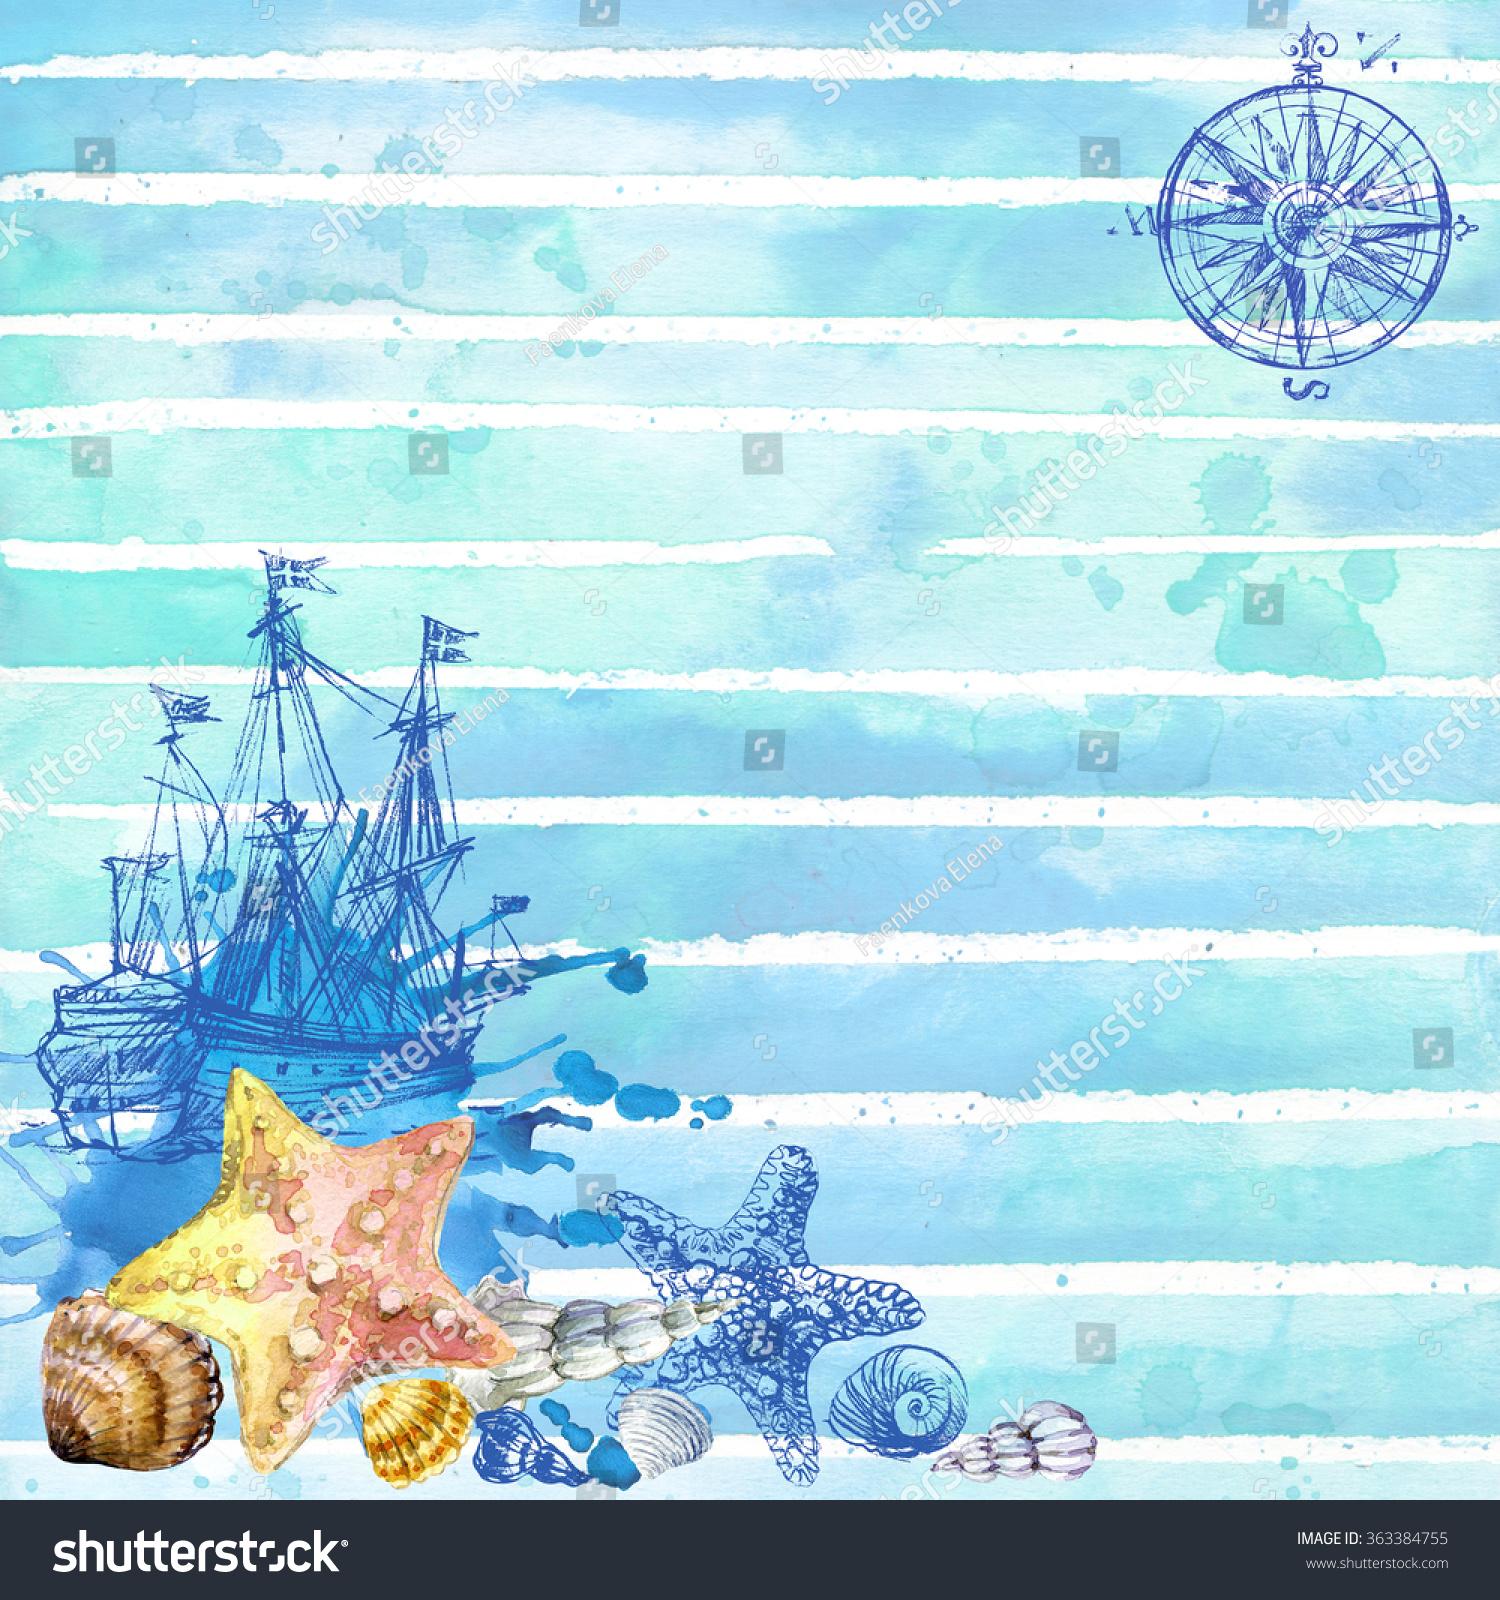 Undersea World Sea Theme Watercolor Wallpaper Stock Illustration ...